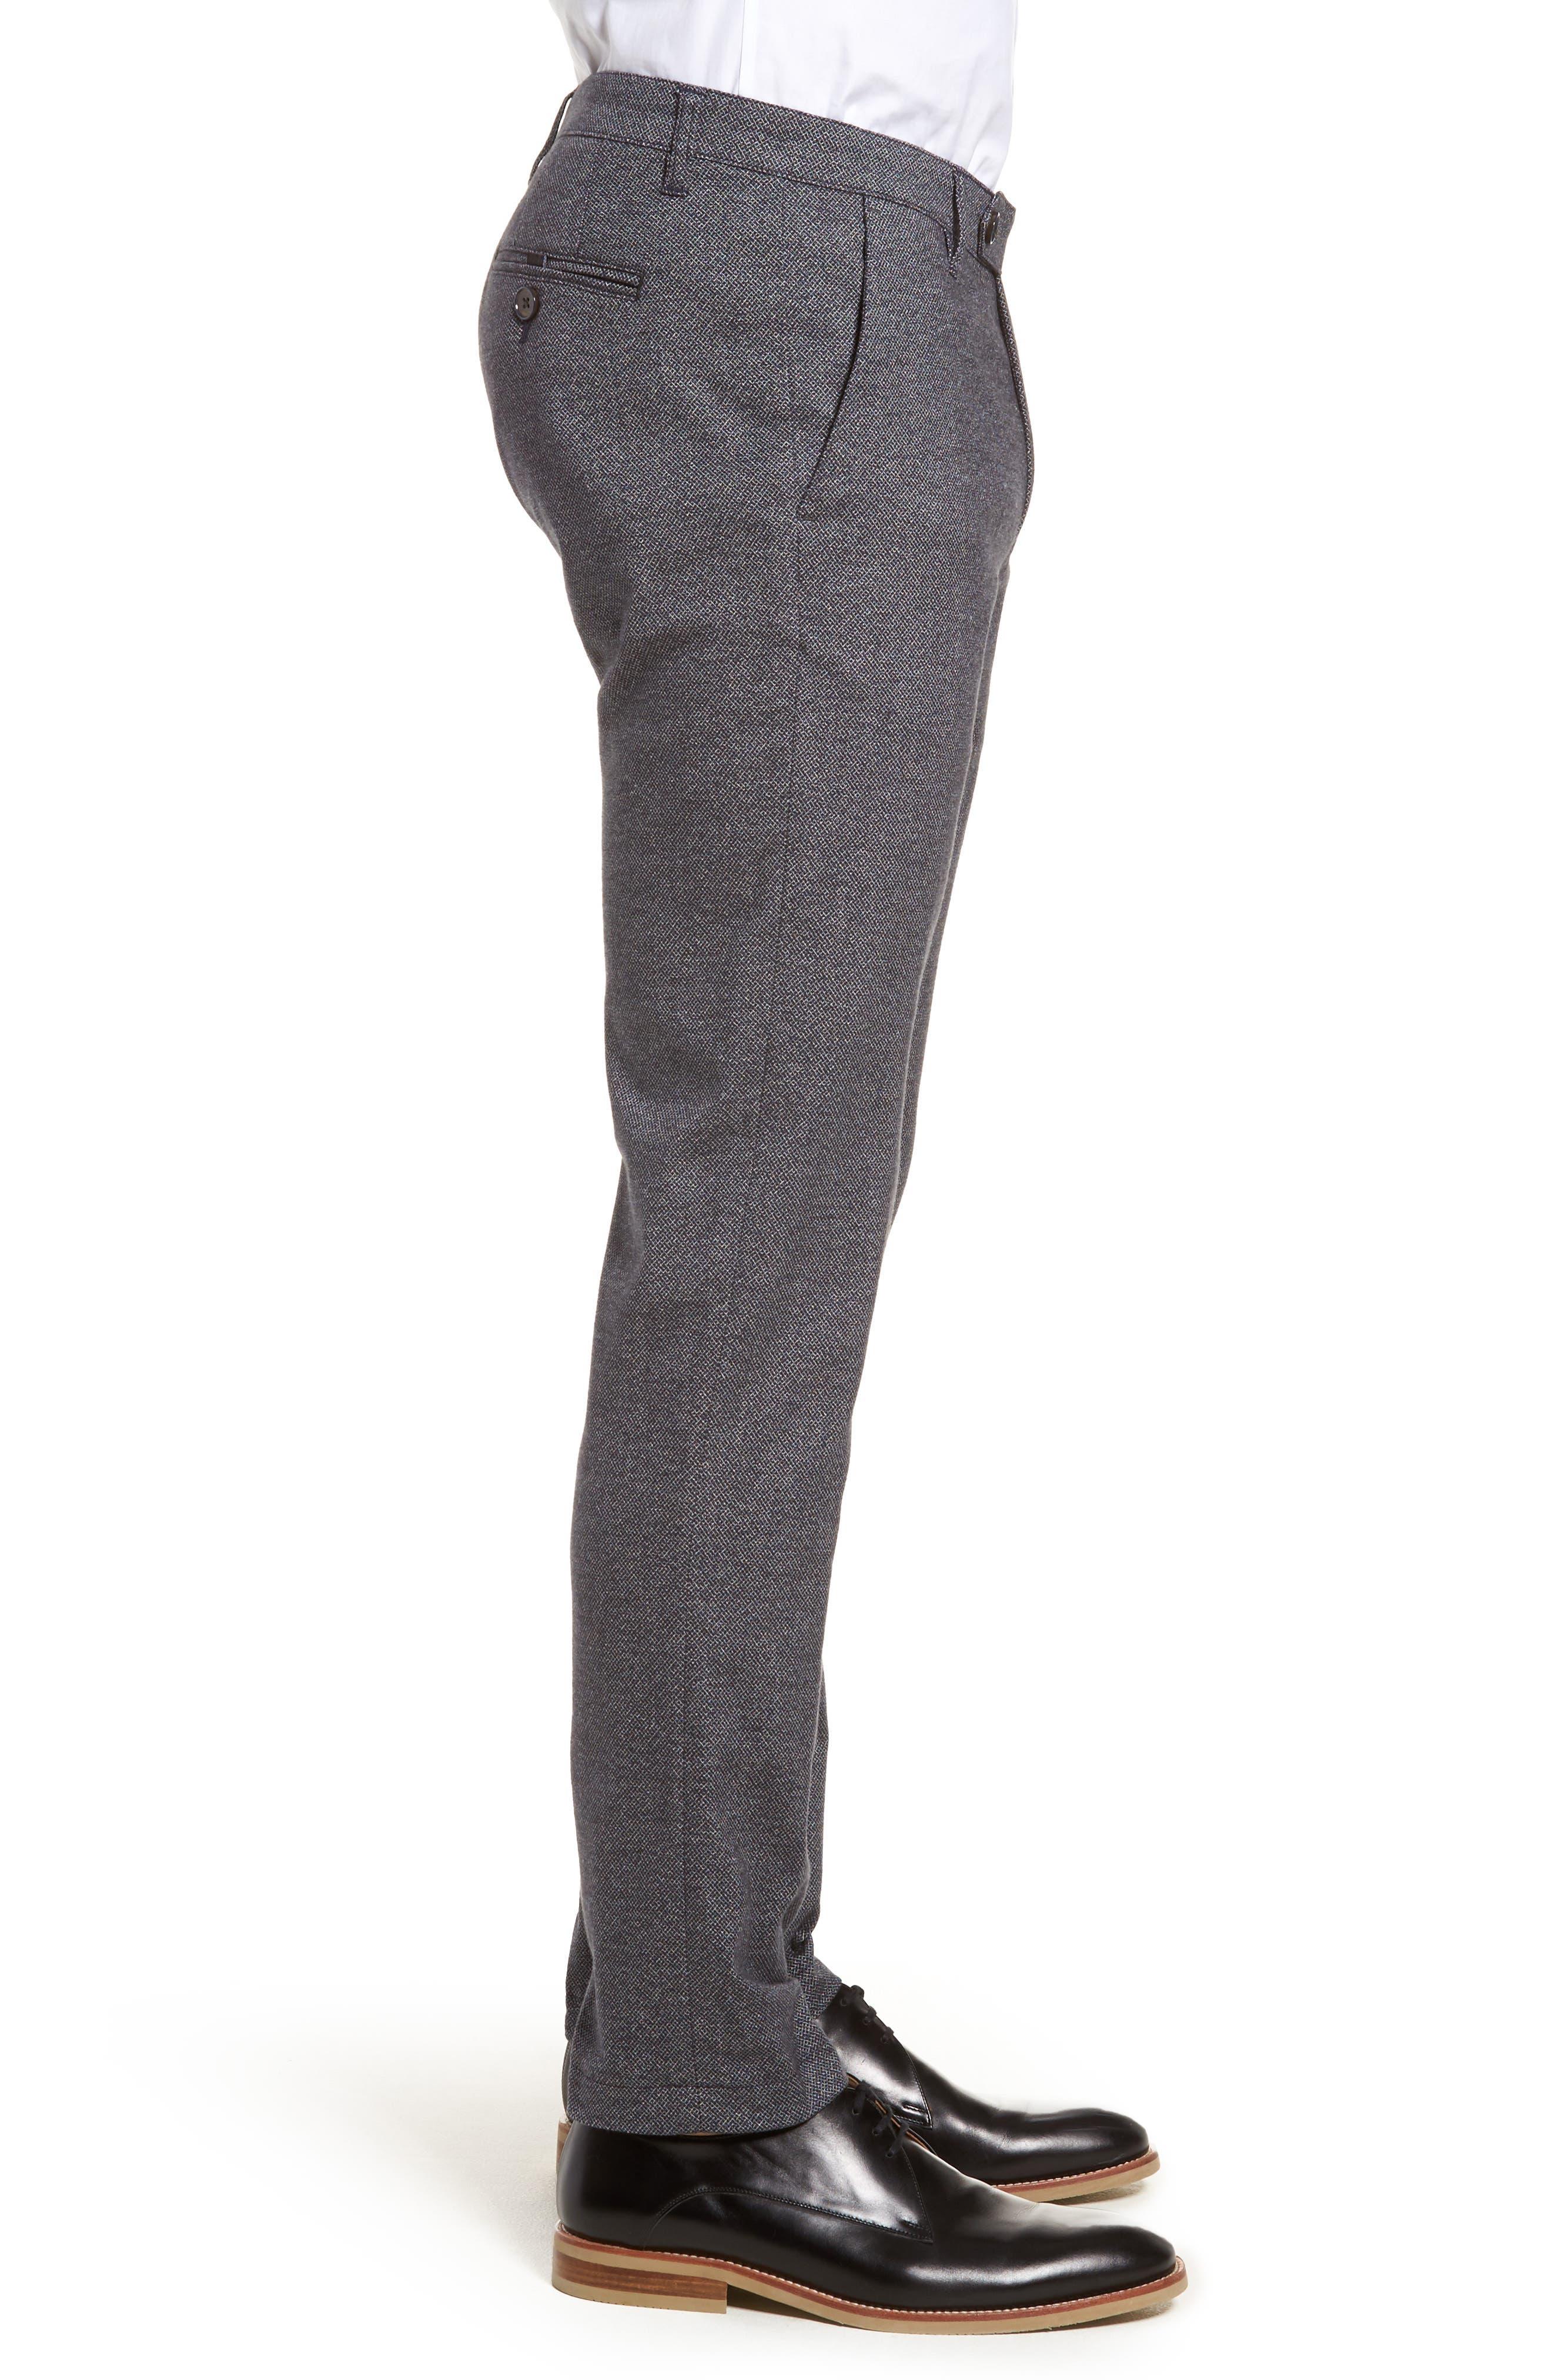 Pintz Slim Fit Trousers,                             Alternate thumbnail 3, color,                             Navy